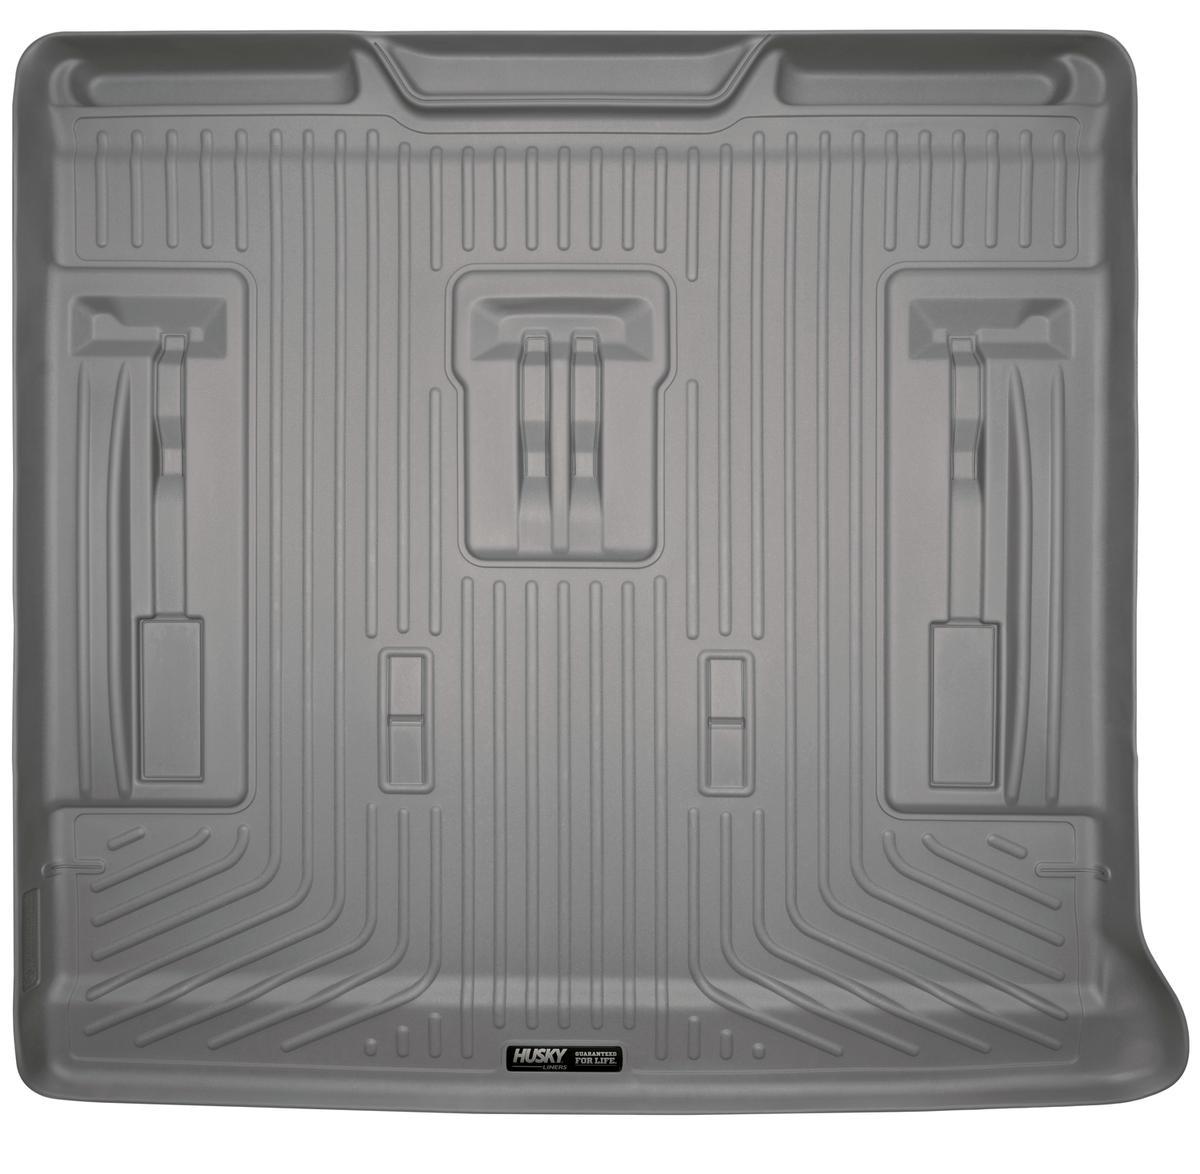 Cadillac Escalade 3rd Row Seats: Husky Liners Cargo Liner Fits 07-14 Escalade/Tahoe/Yukon W/ 3rd Row Seat